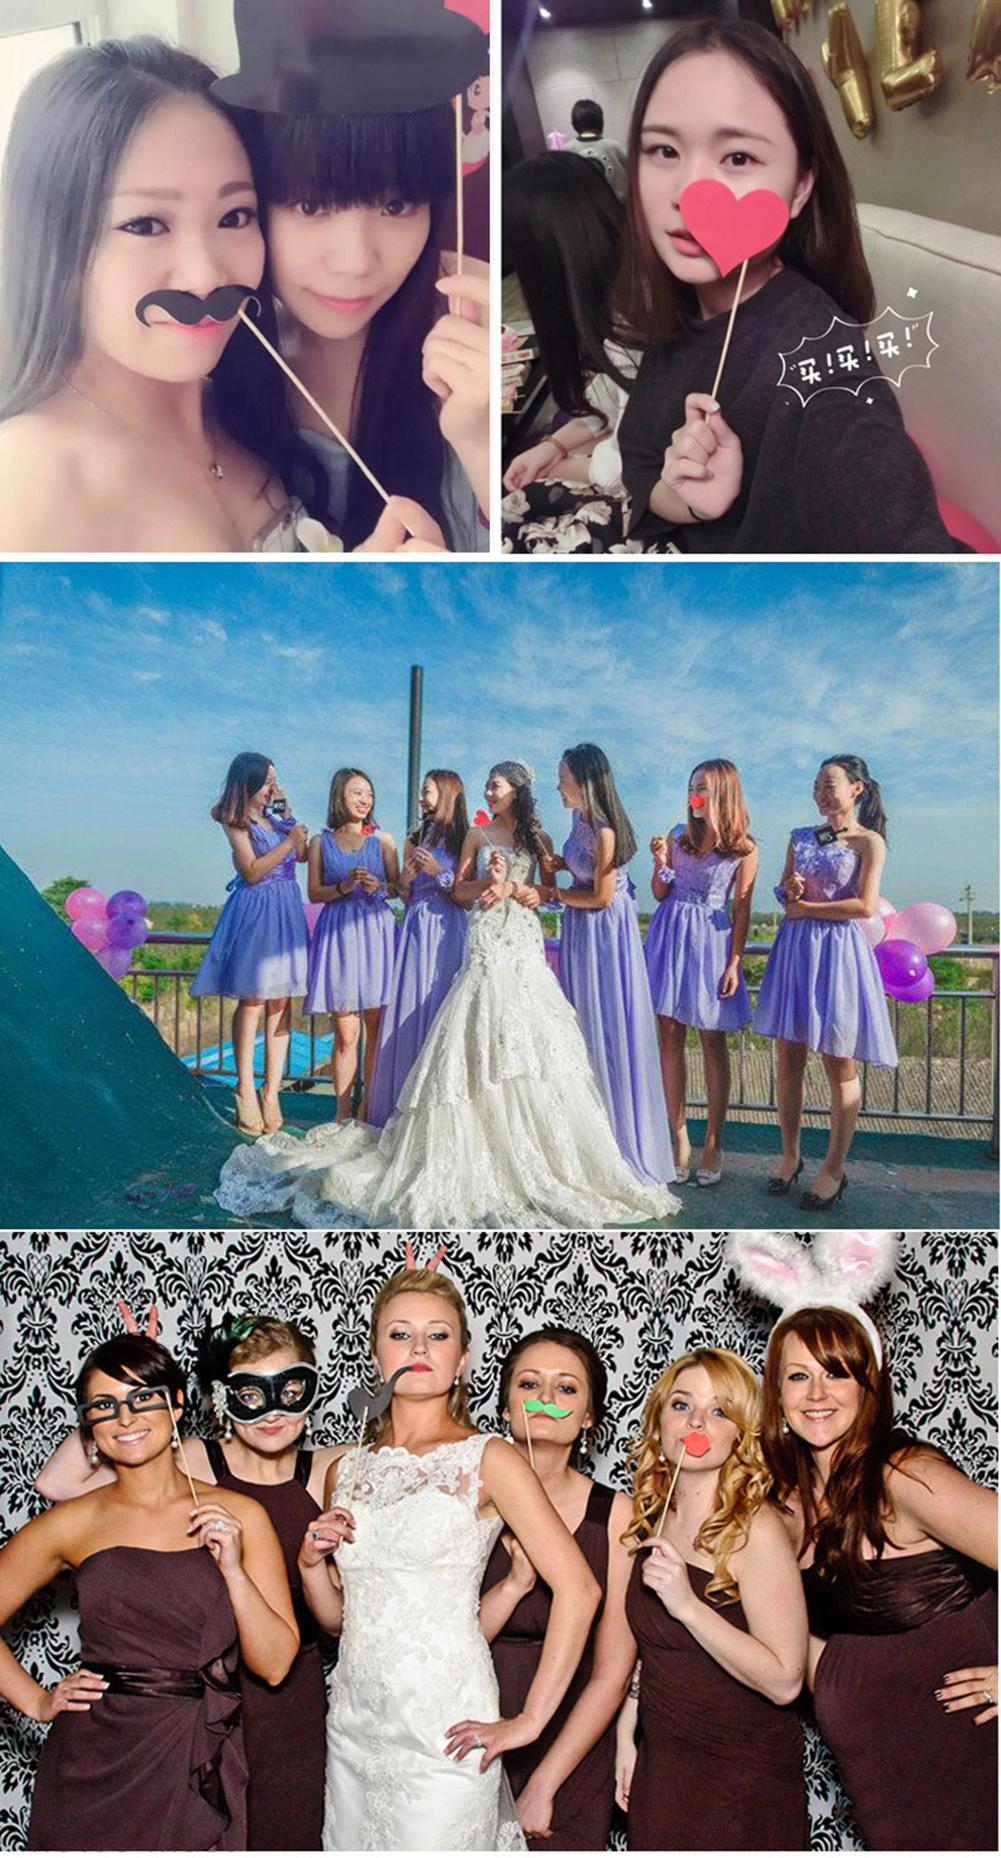 58pcs DIY Photo Booth Props DIY Kit Wedding Birthday Decorations Party Supplies